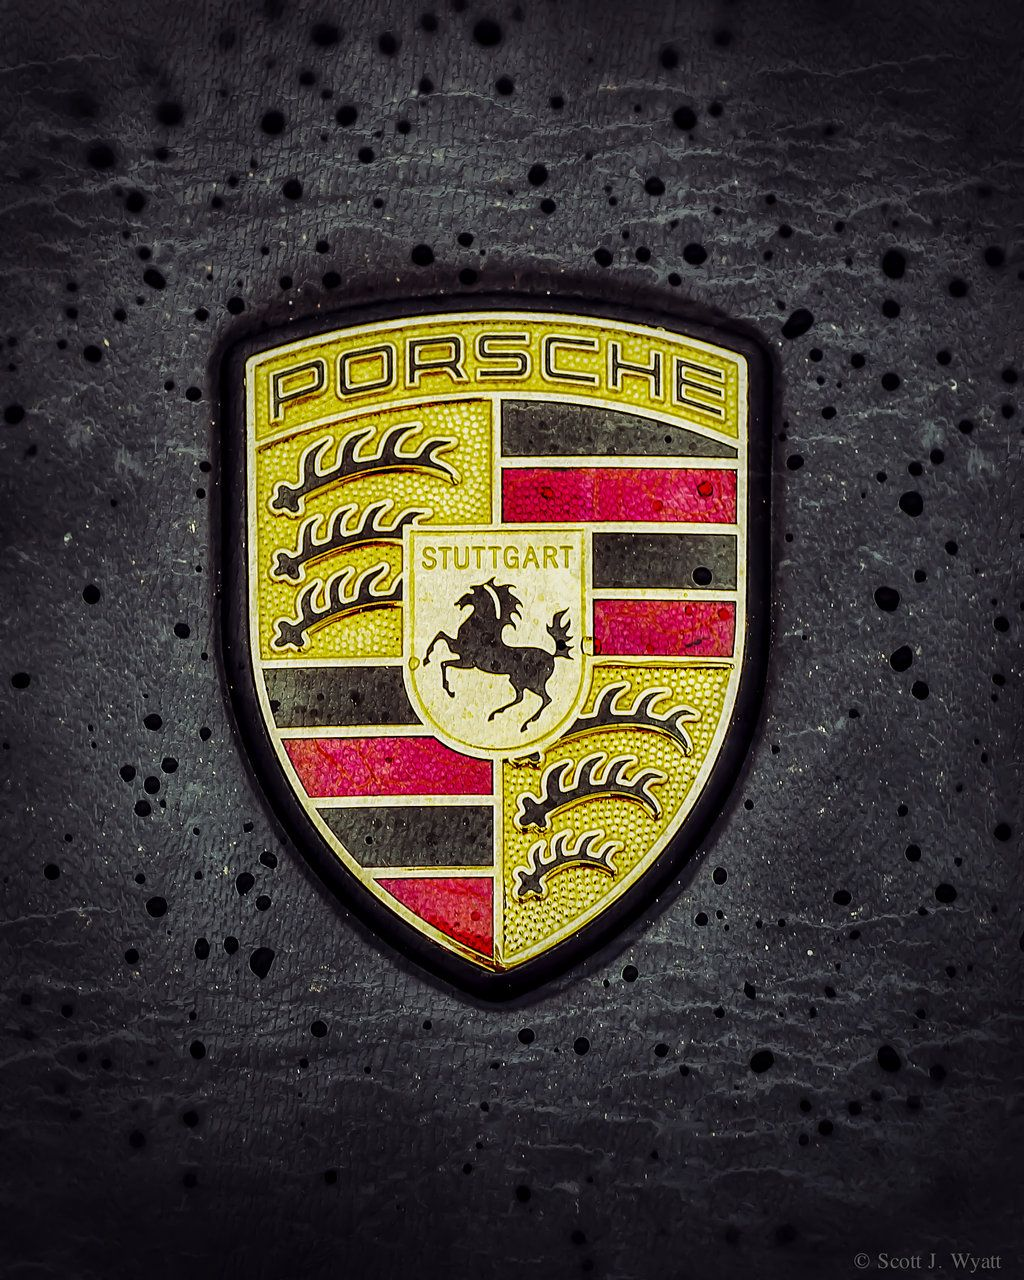 Porsche Logo Wallpapers For Android On Wallpaper 1080p Hd Porsche